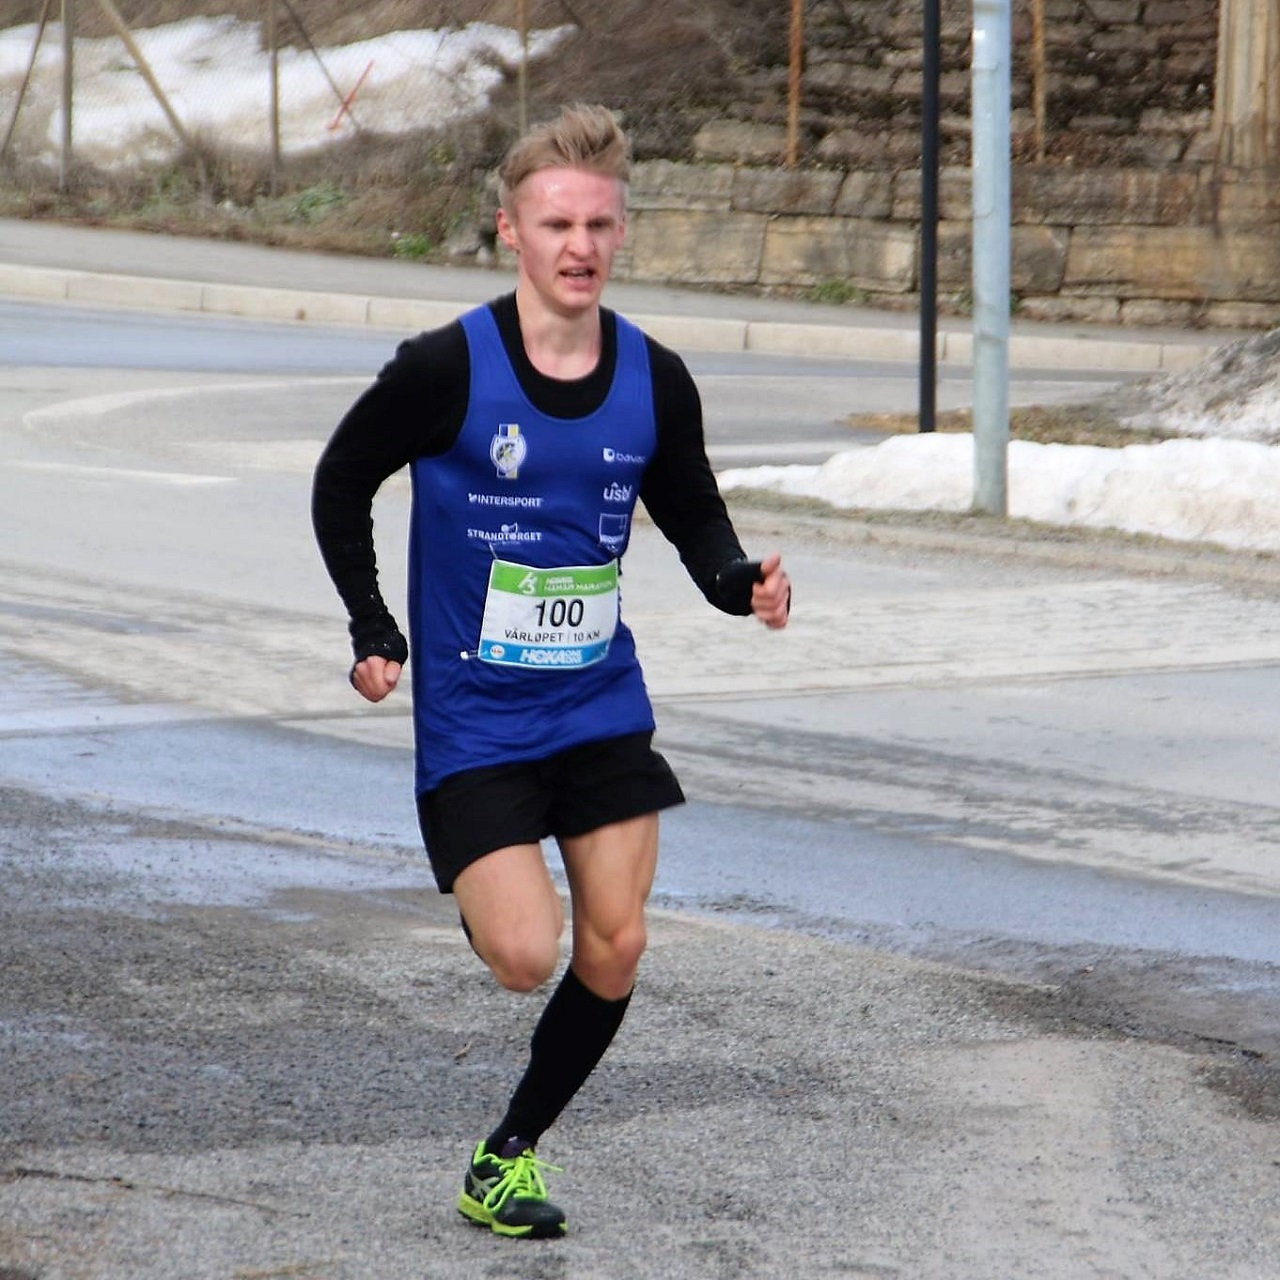 Petter_Johansen.jpg